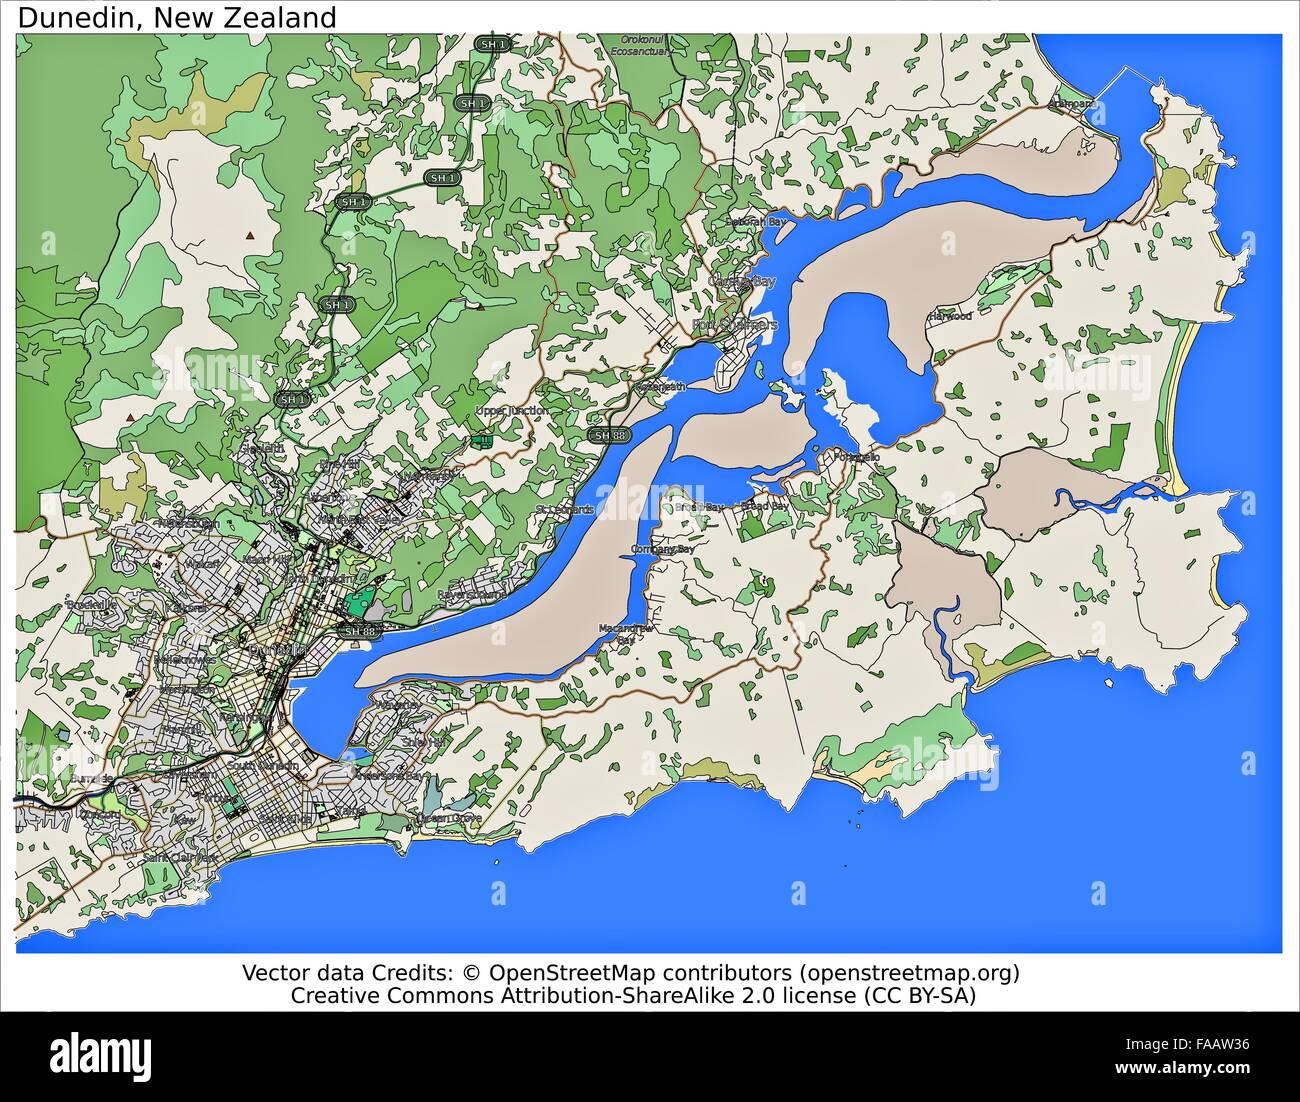 Map Of Dunedin New Zealand.Dunedin New Zealand City Map Stock Photo 92437610 Alamy